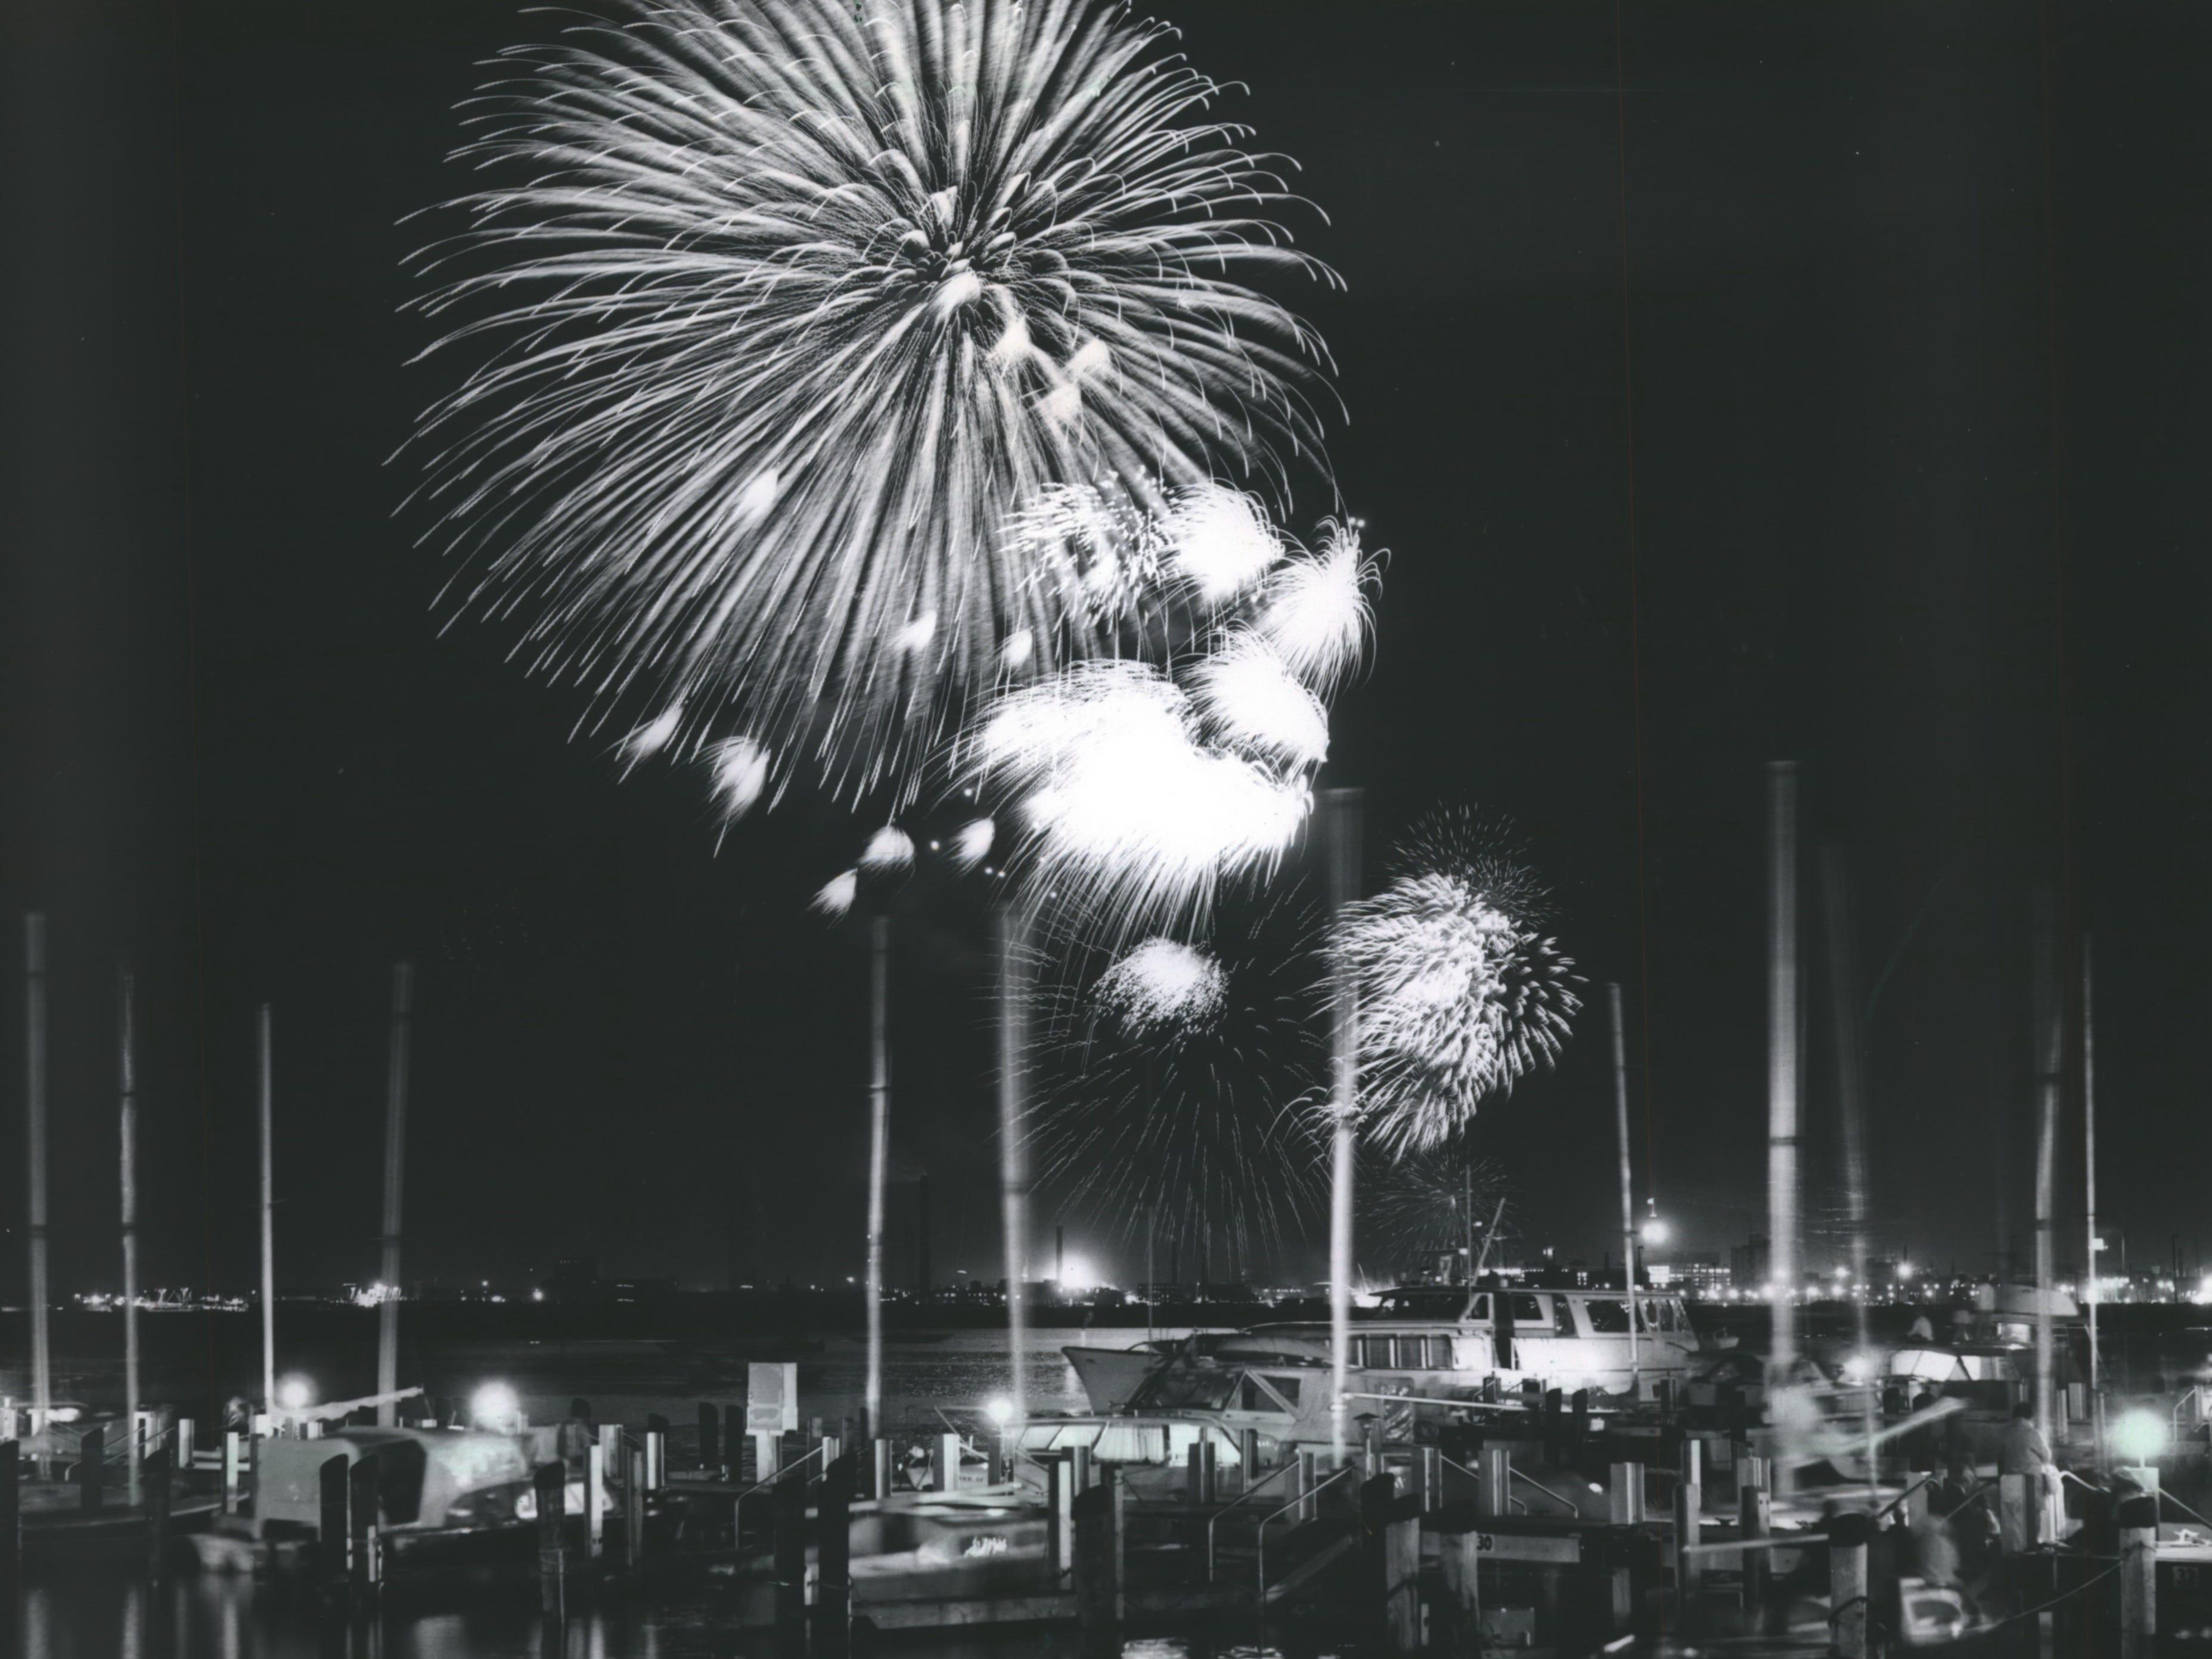 Fireworks burst above the McKinley Marina on July 3, 1967.